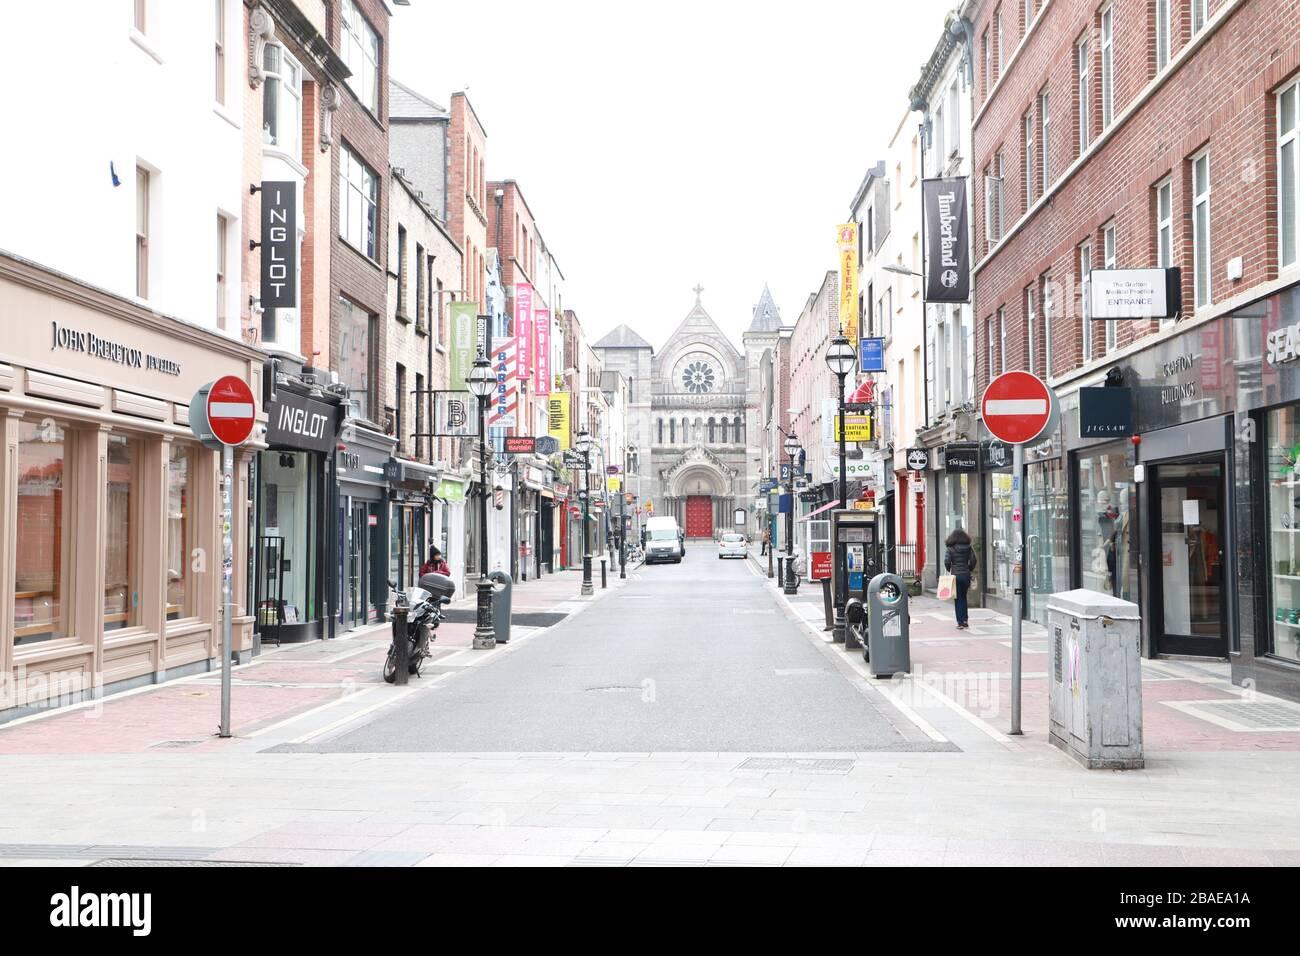 Car Rentals in Finglas, Dublin: Cheap Rental Car Deals from